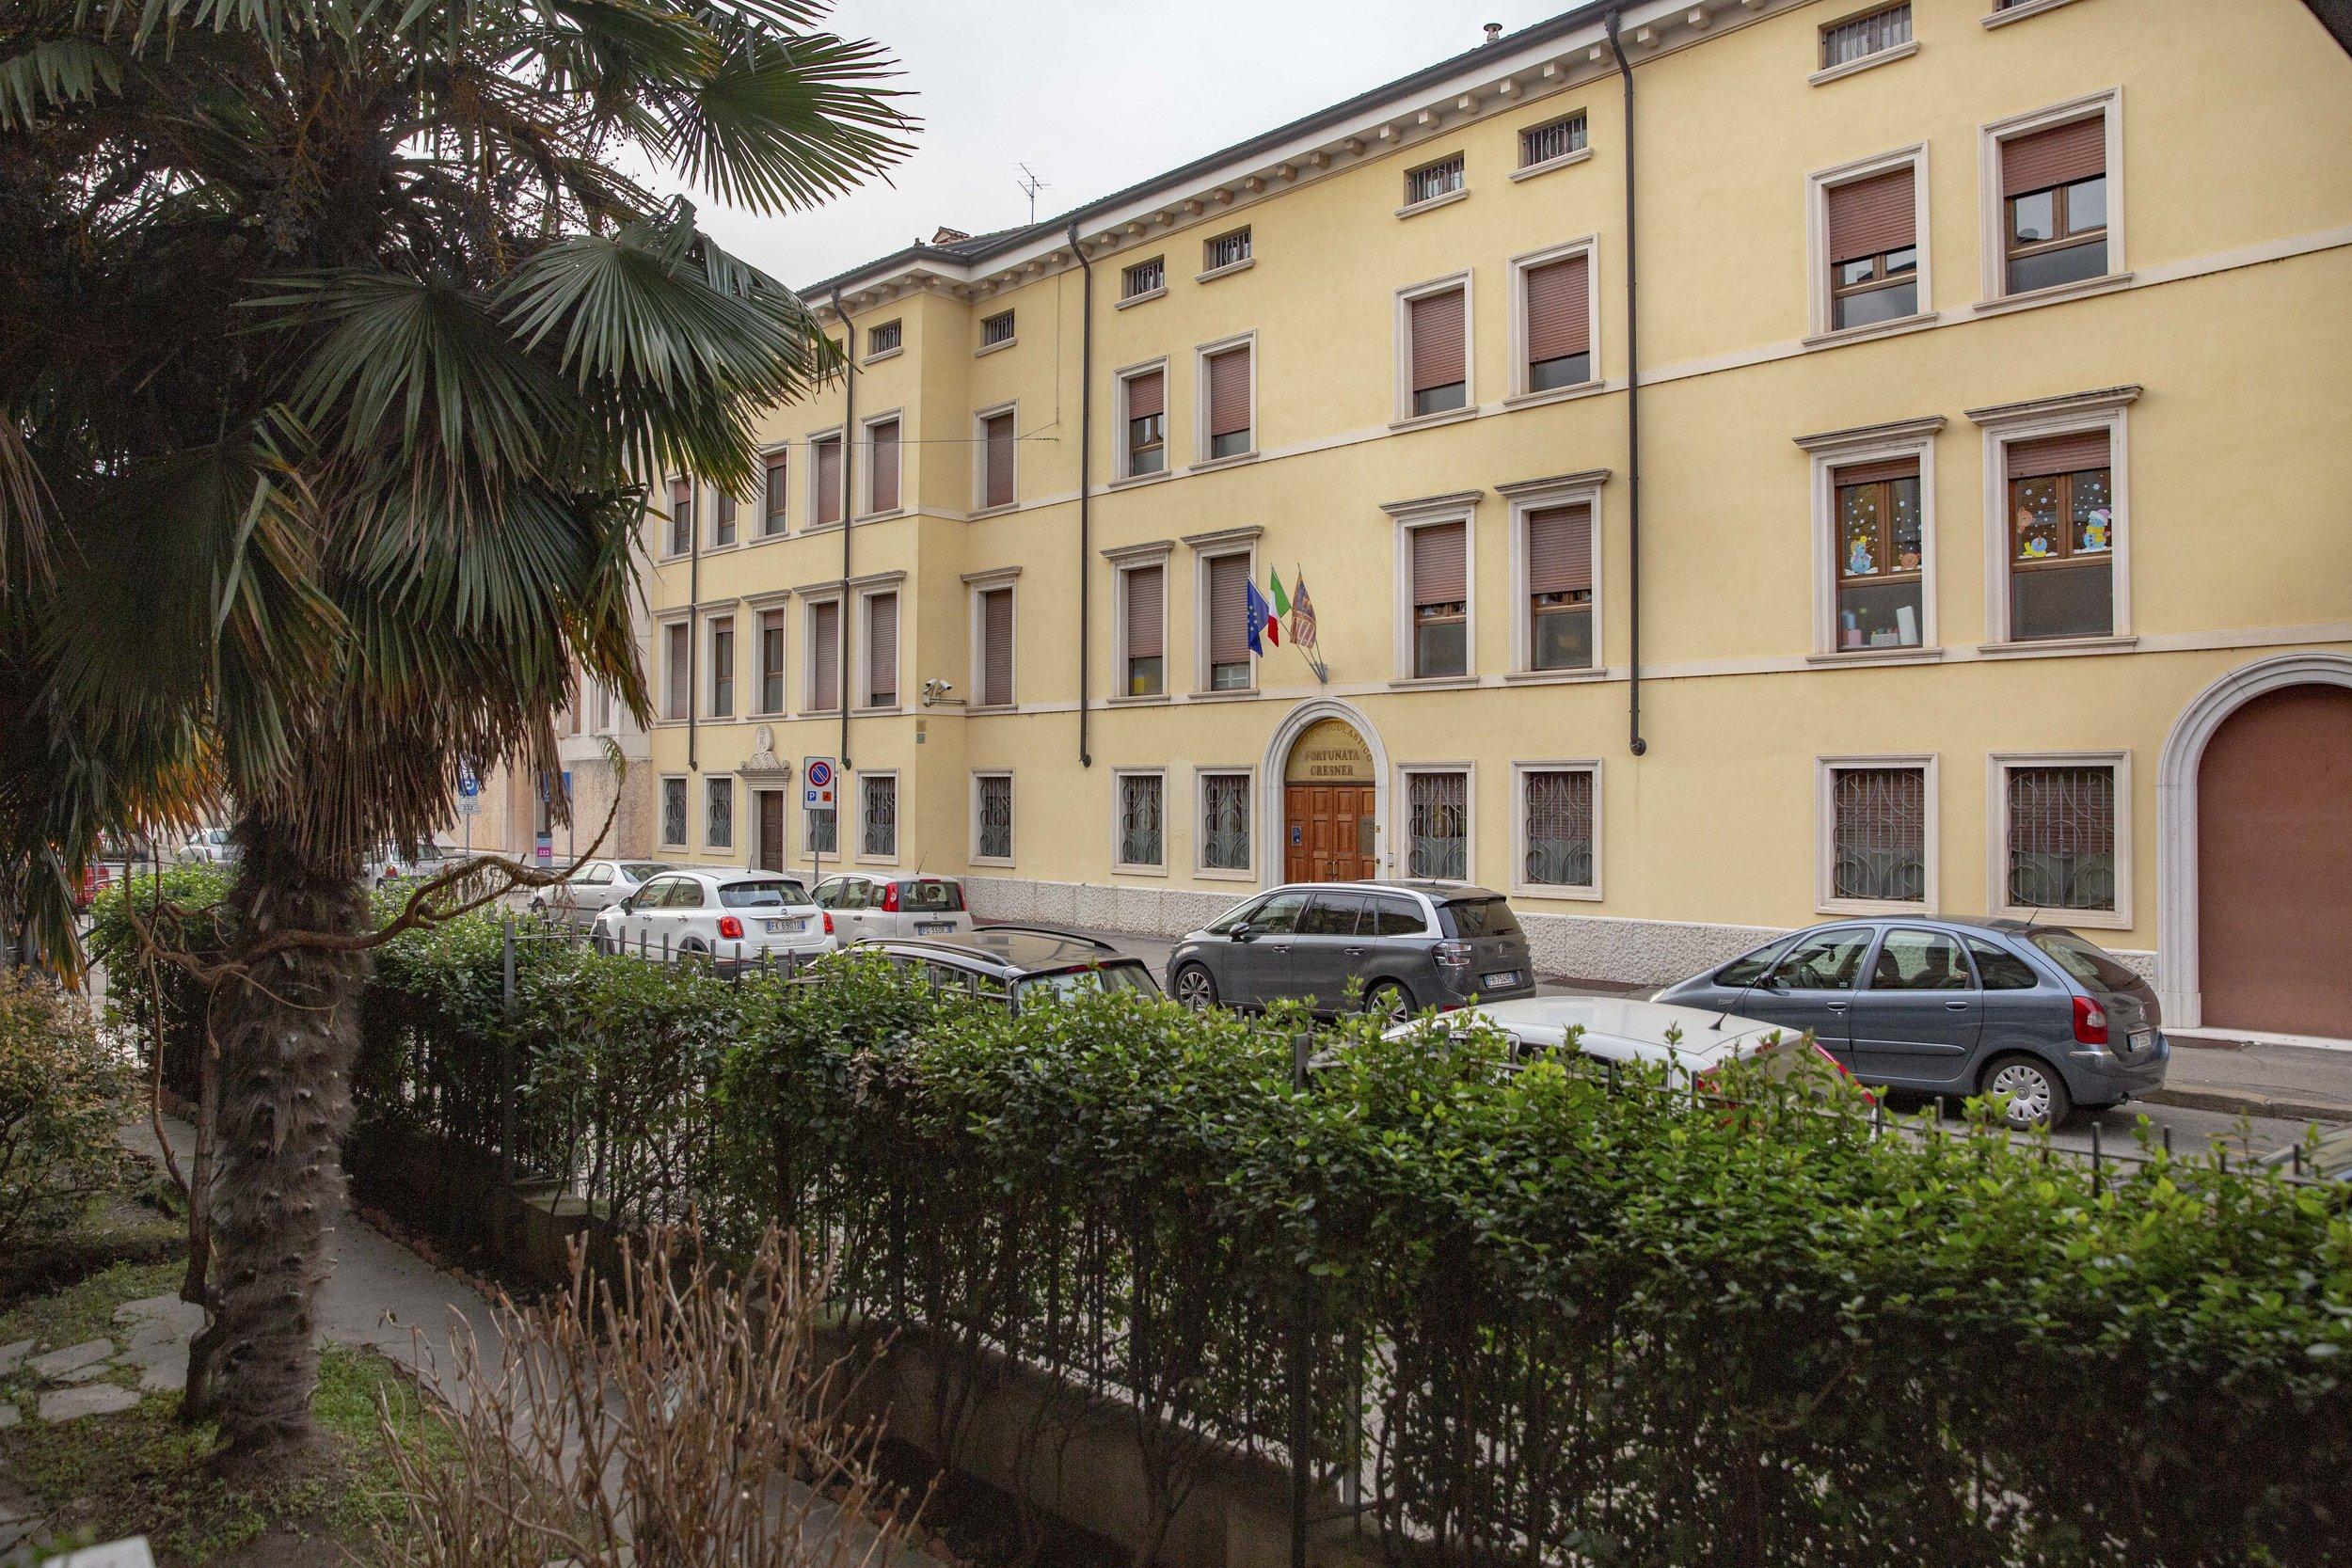 FRANCESCAVOLPI_THENEWYORKTIMES_ITALY _9.jpg